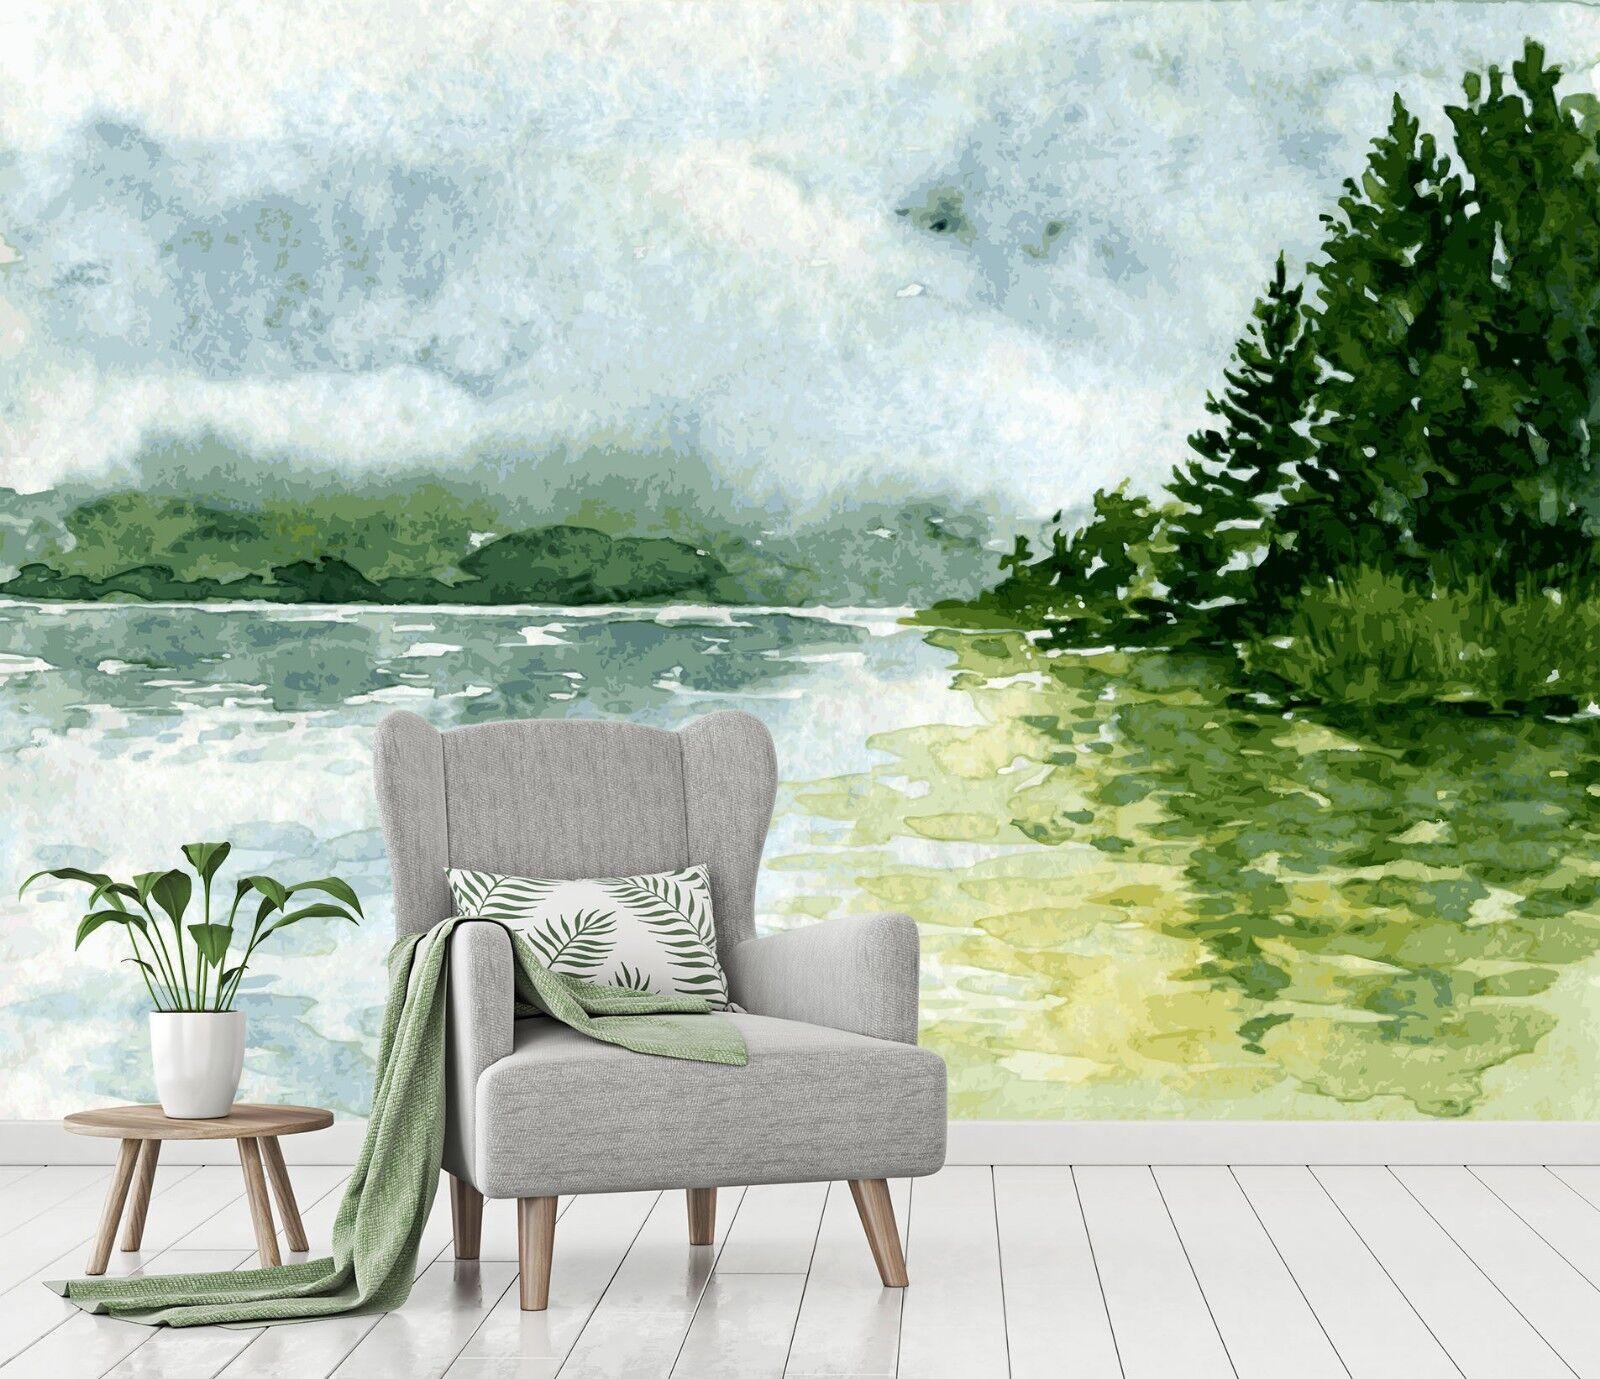 3D Sky Lake Forest 563 Wallpaper Murals Wall Print Wallpaper Mural AJ WALL UK